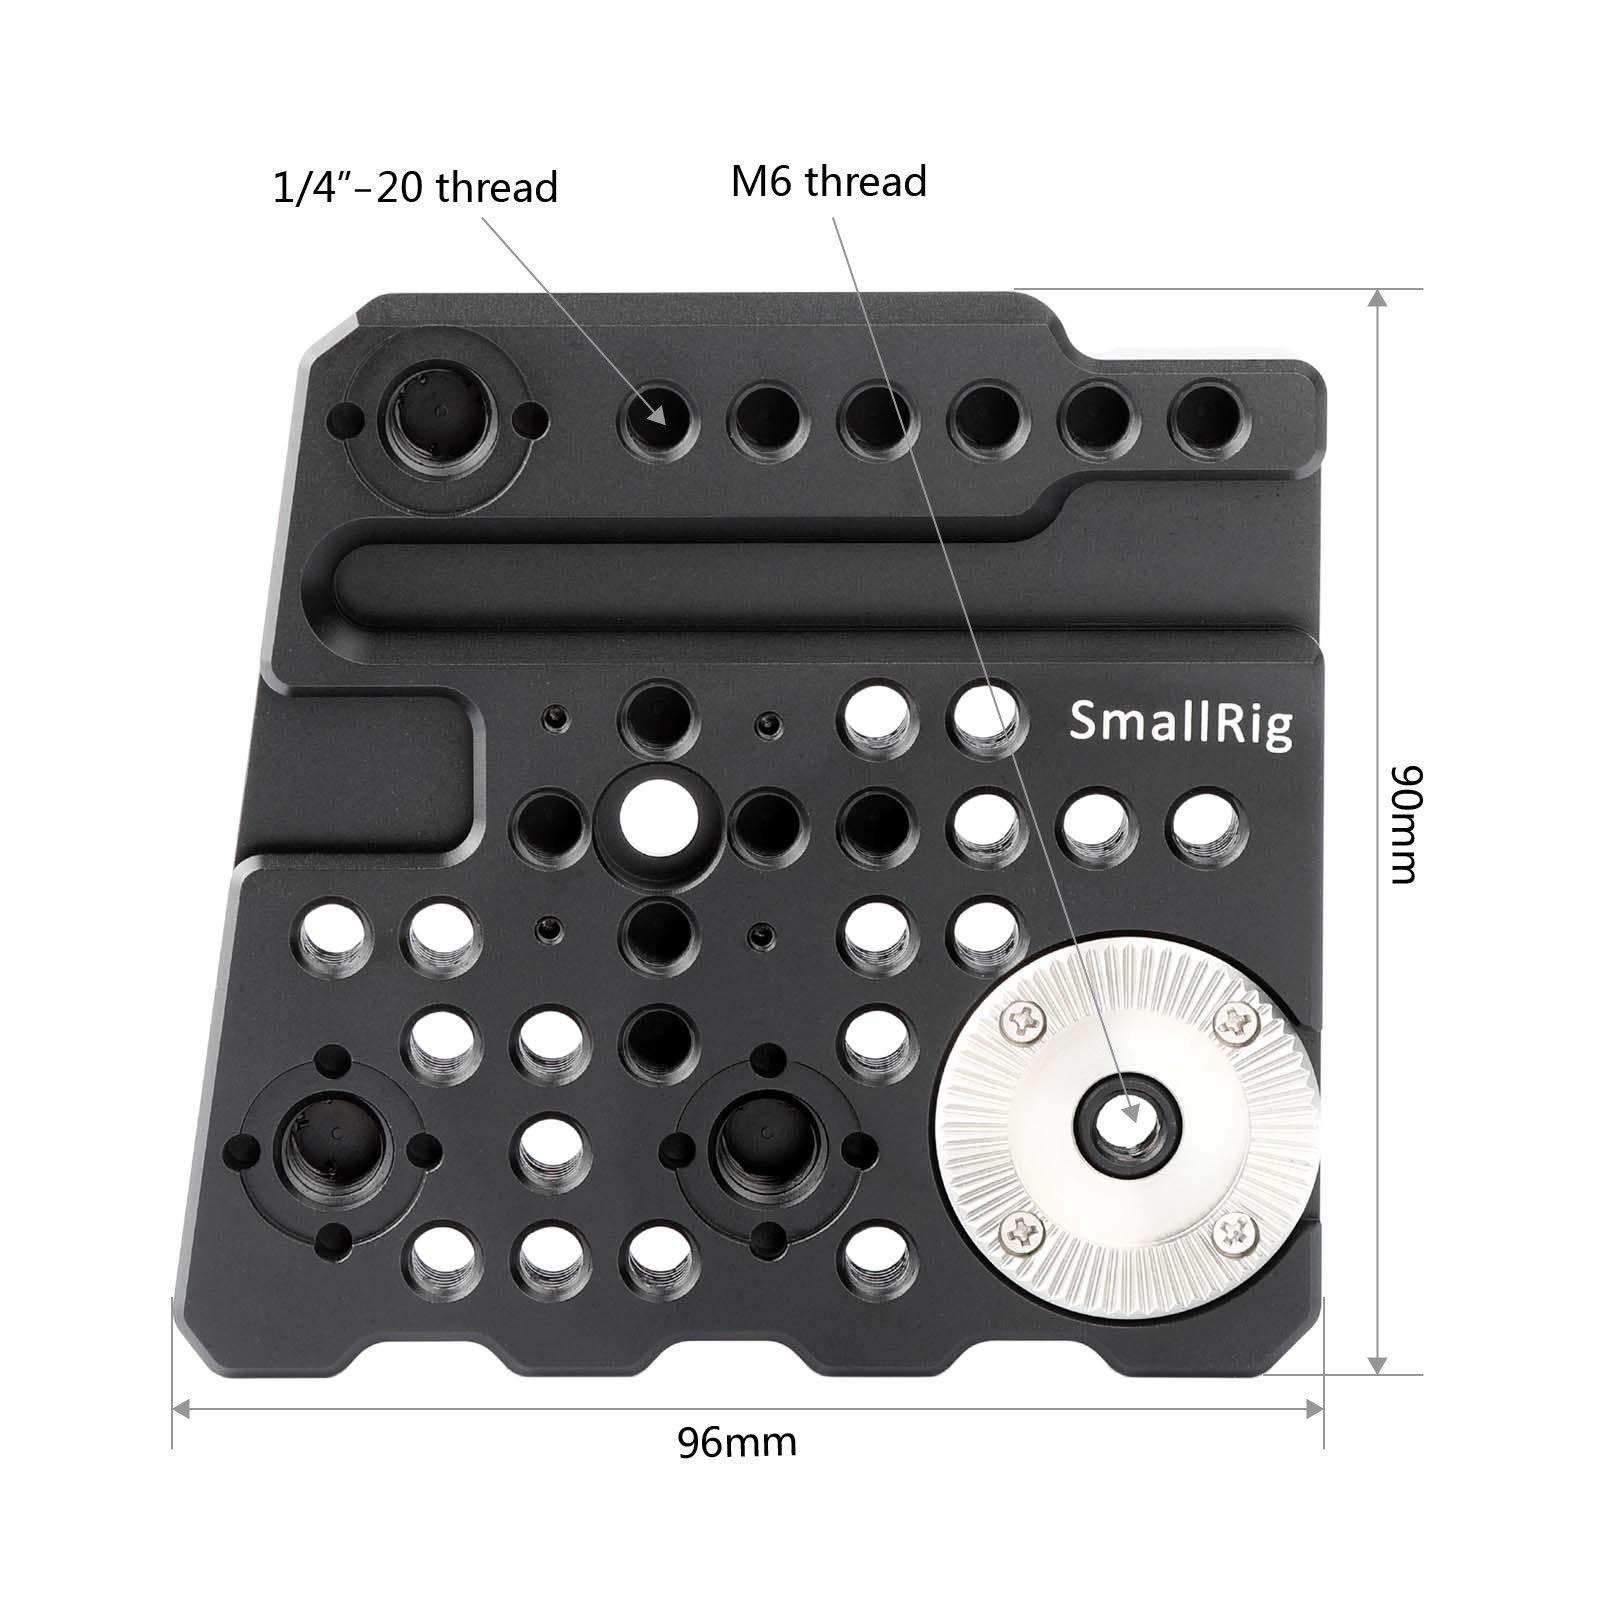 SMALLRIG Rosette Side Plate for BlackMagic URSA Mini, URSA Mini Pro Camera- 1854 by SmallRig (Image #4)